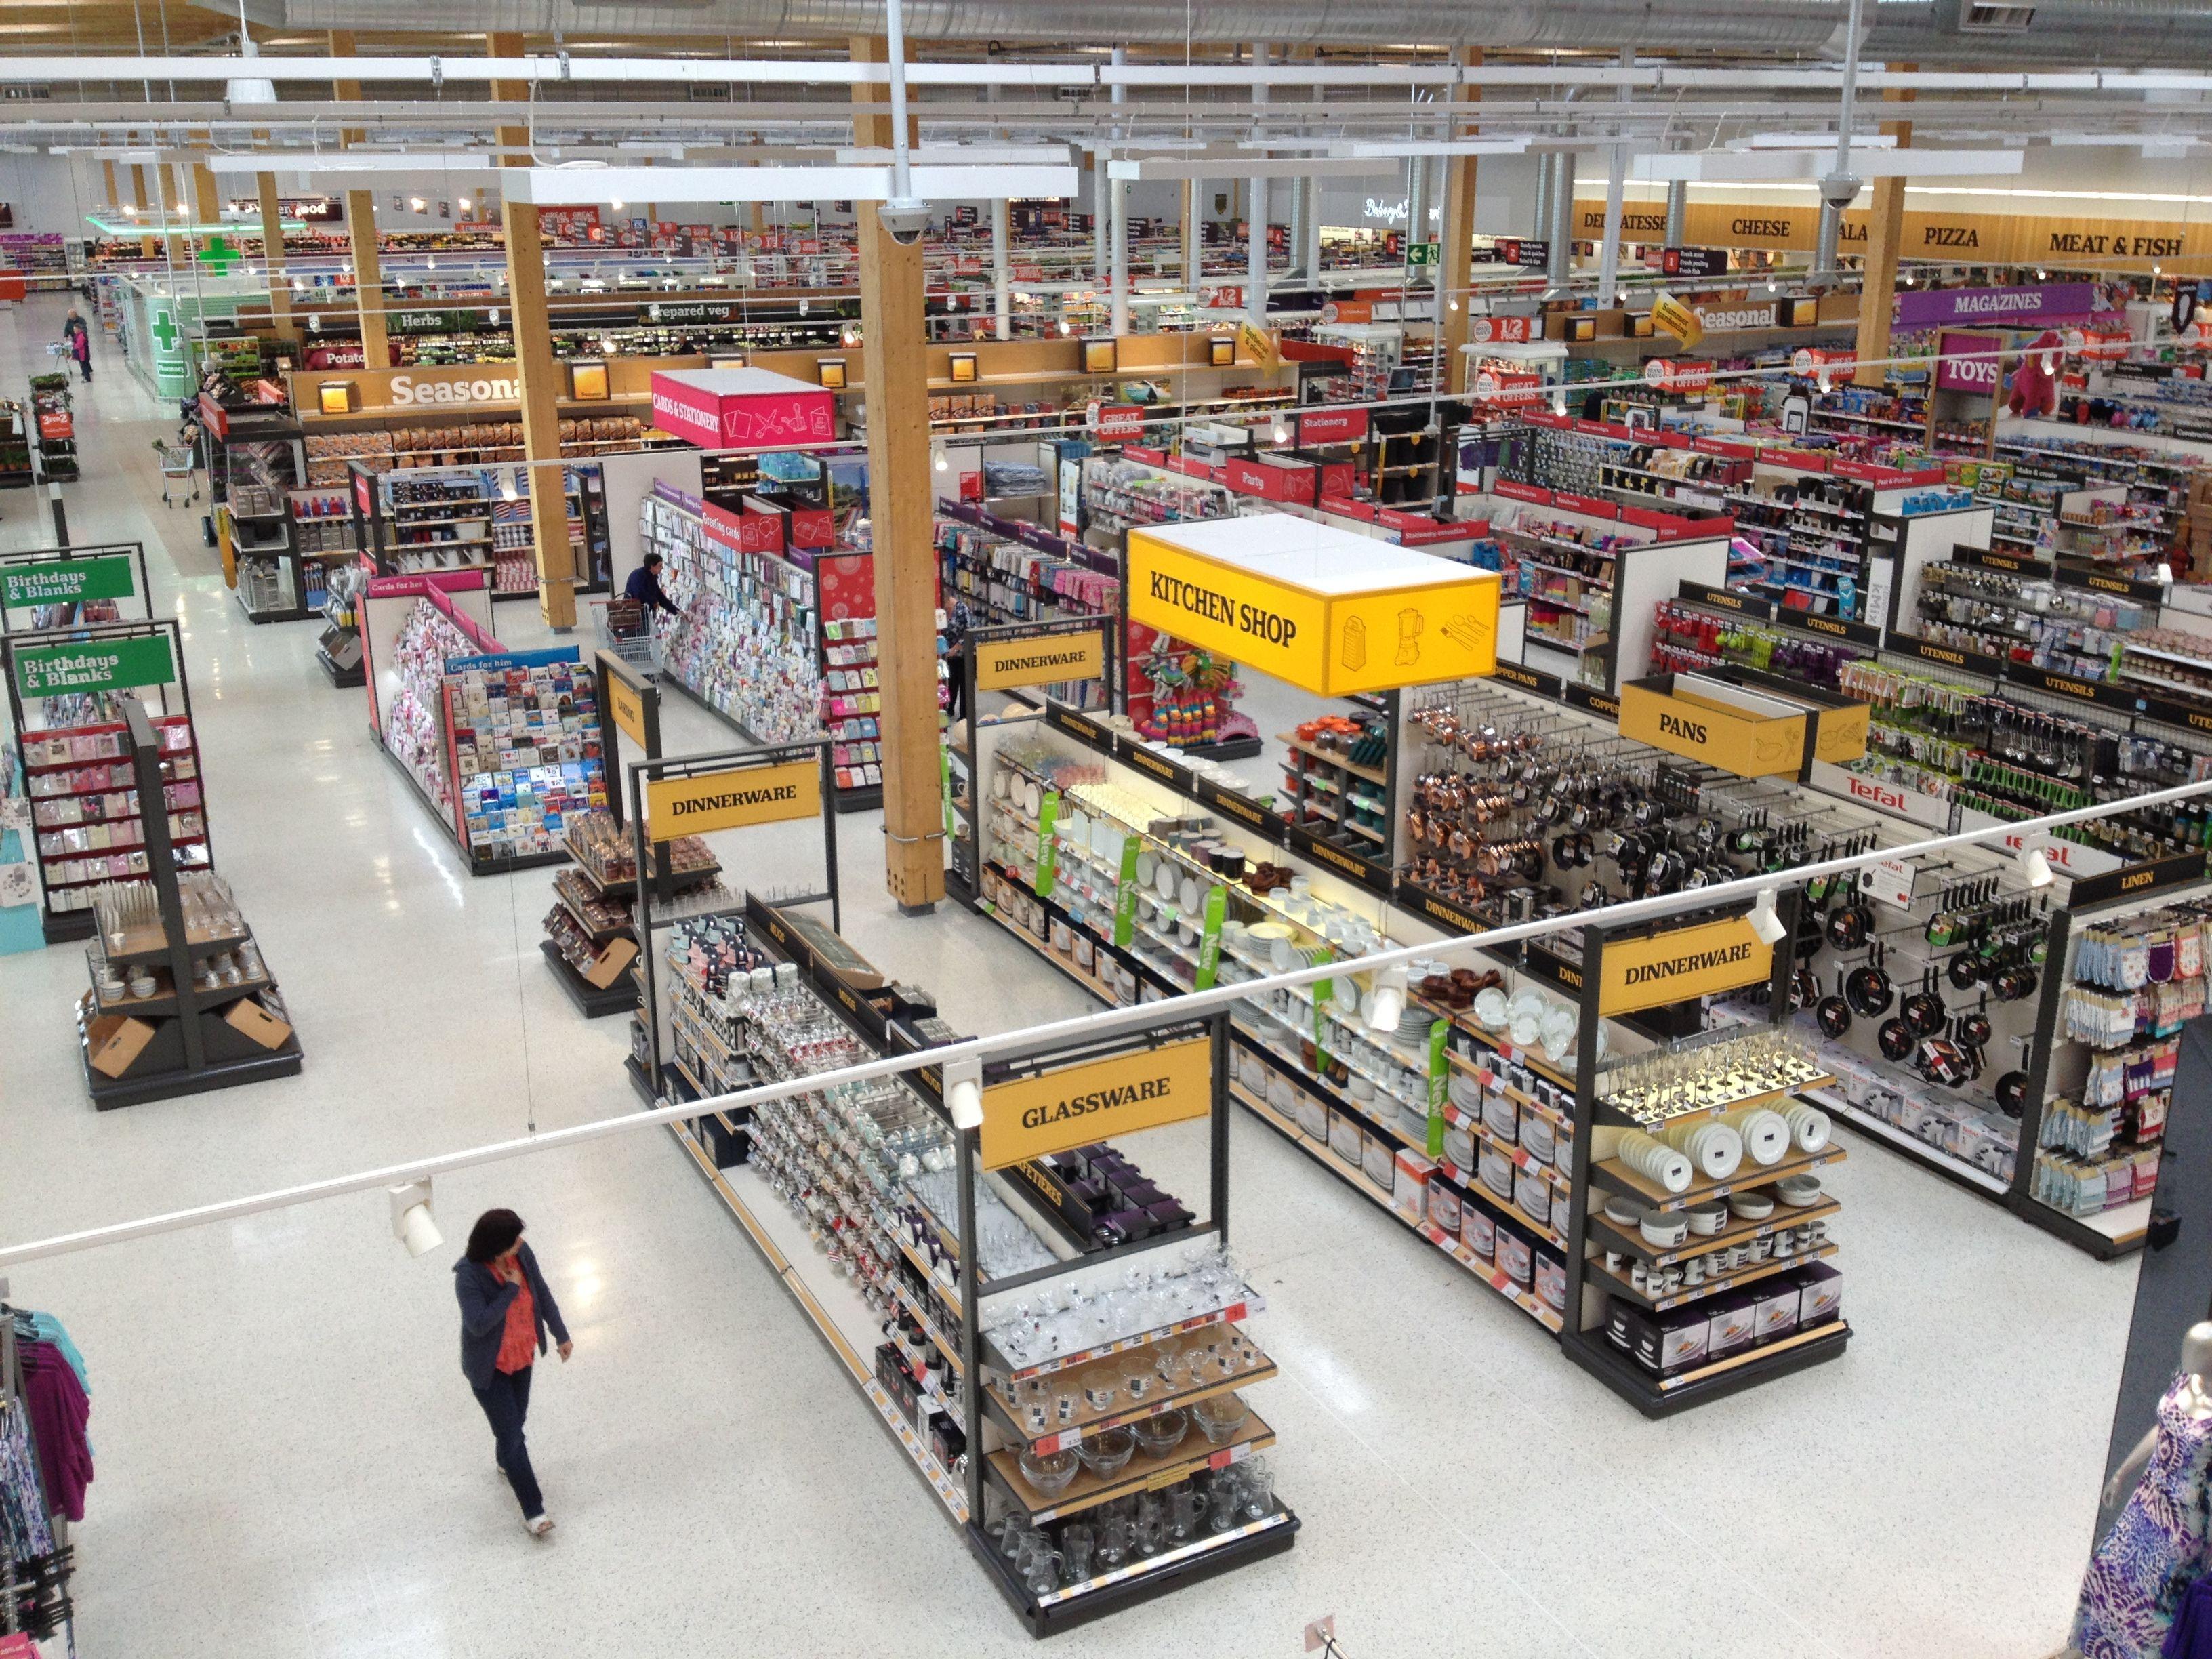 Sainsbury S Kings Lynn Homewares Home Cook Dine Supermarket General Merchandise Non Food Layou Supermarket Design Store Design Shop Interiors